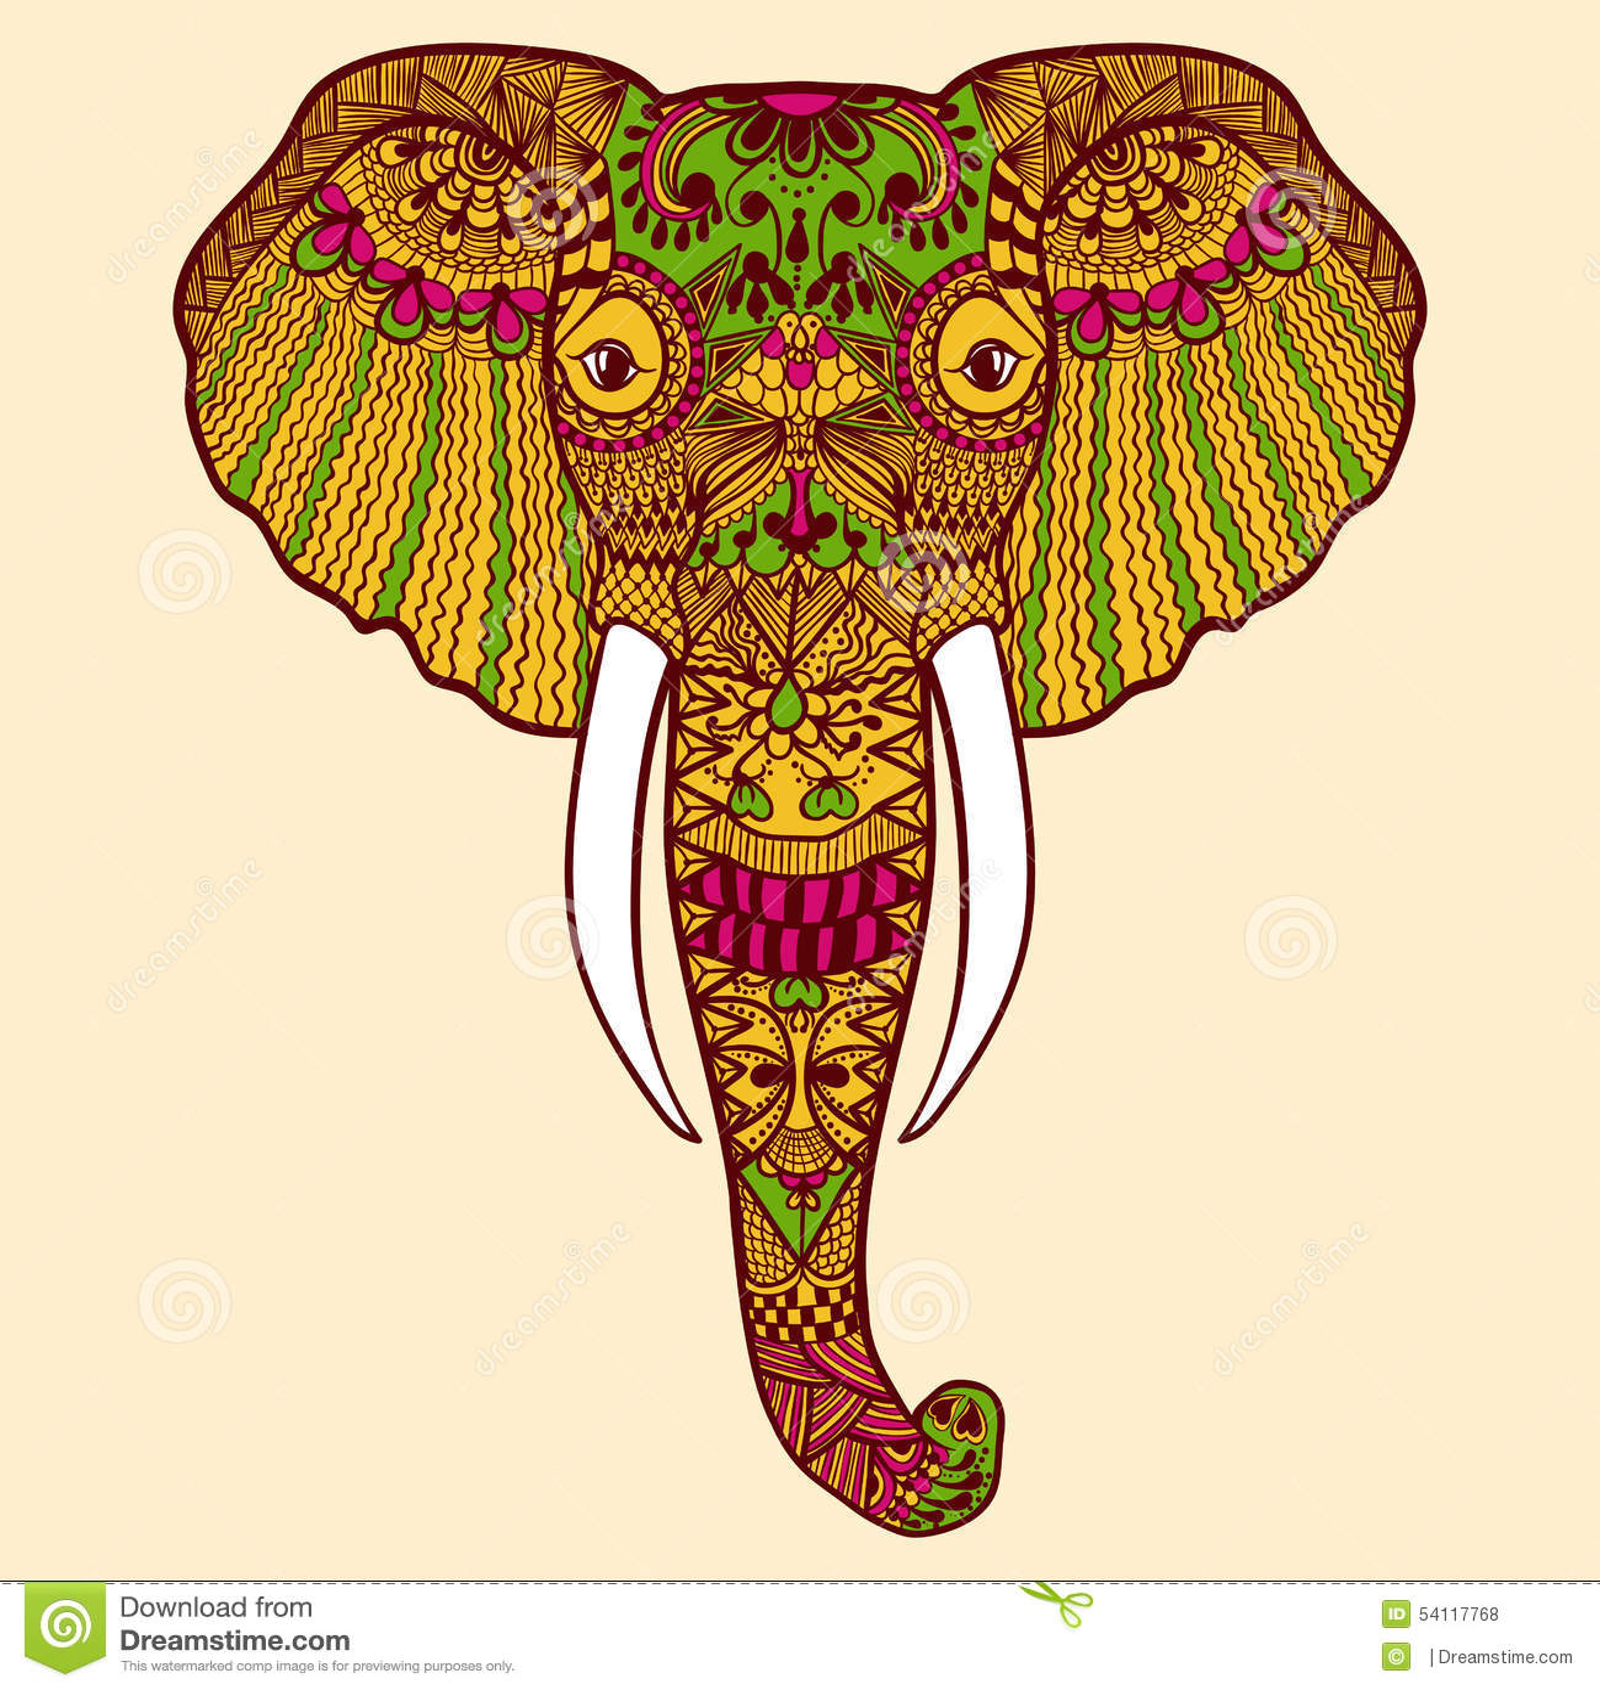 Zentangle Stylized Indian Elephant Hand Drawn Lace Stock